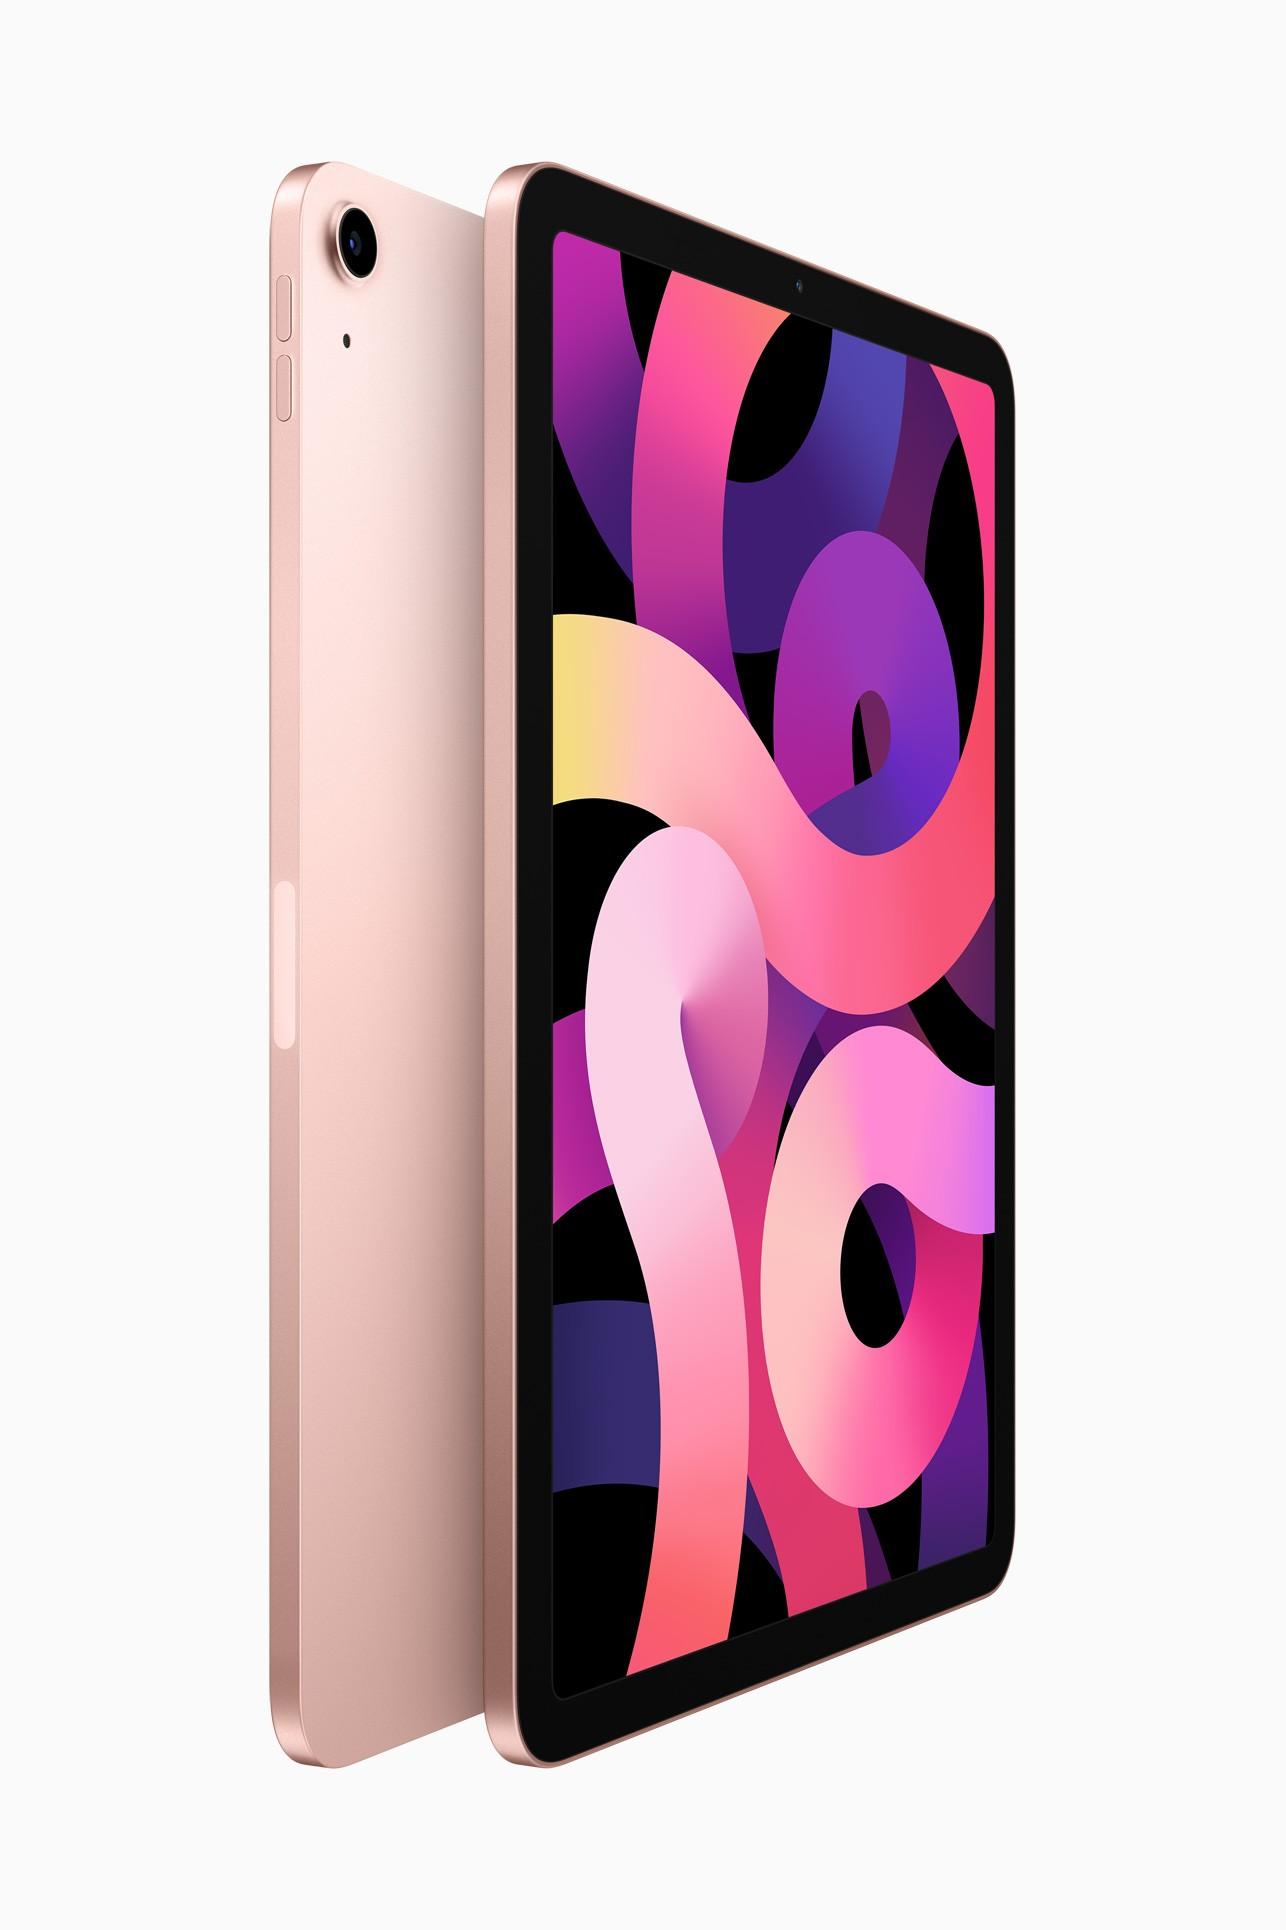 Apple iPad Air 4 Features